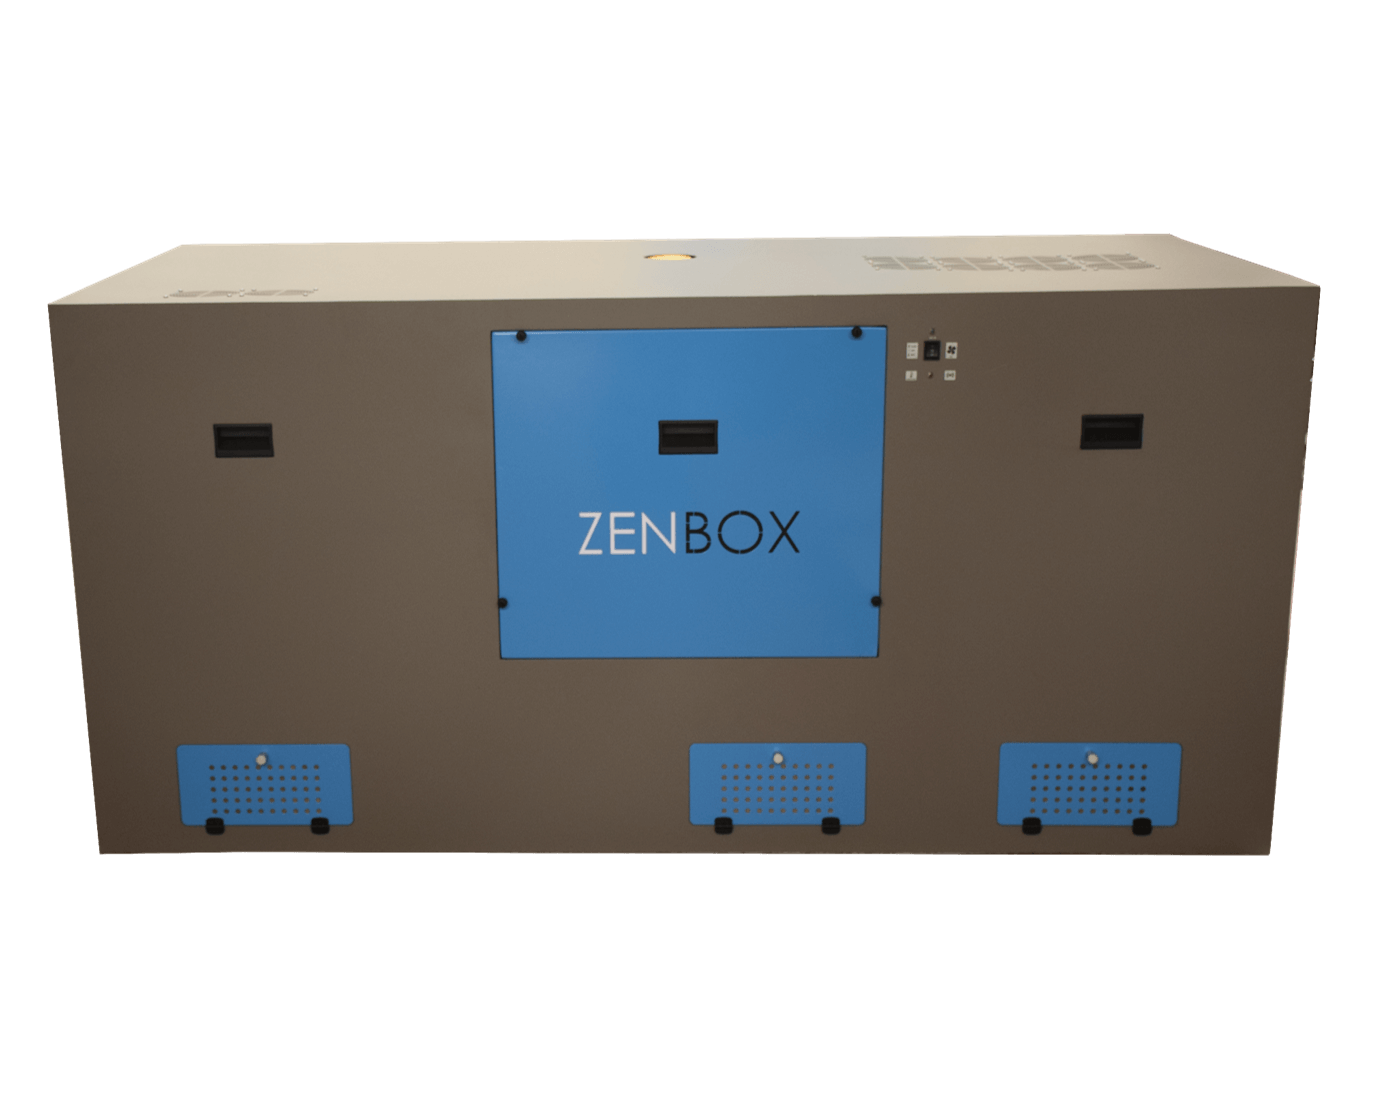 cajas insonorizadas hechas a medida para seis bombas de vacío